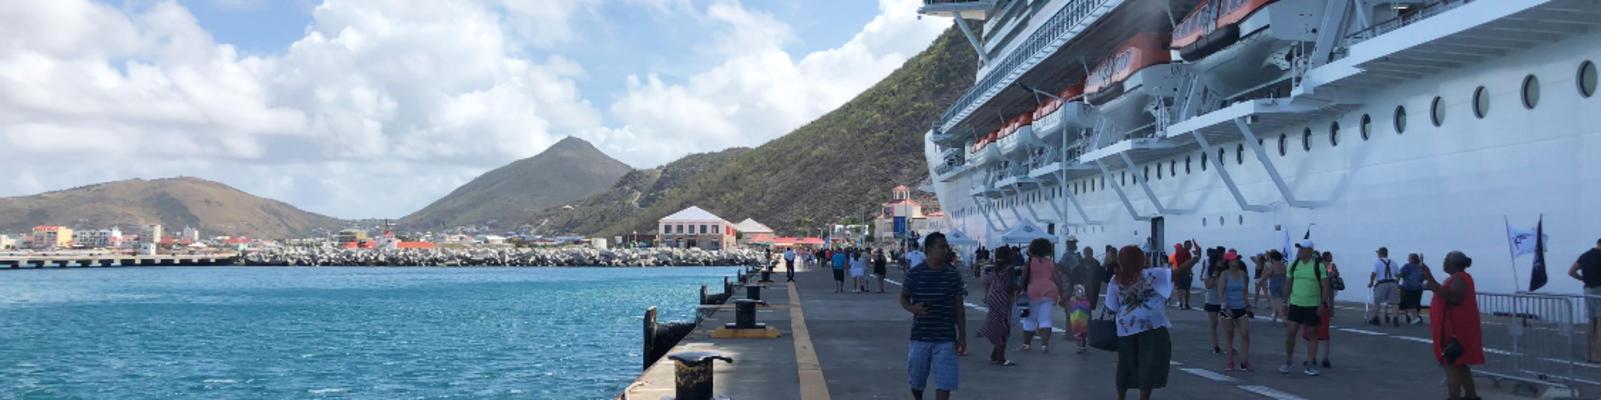 Port of St. Maarten (Photo: Brittany Chrusciel, Cruise Critic Associate Editor)